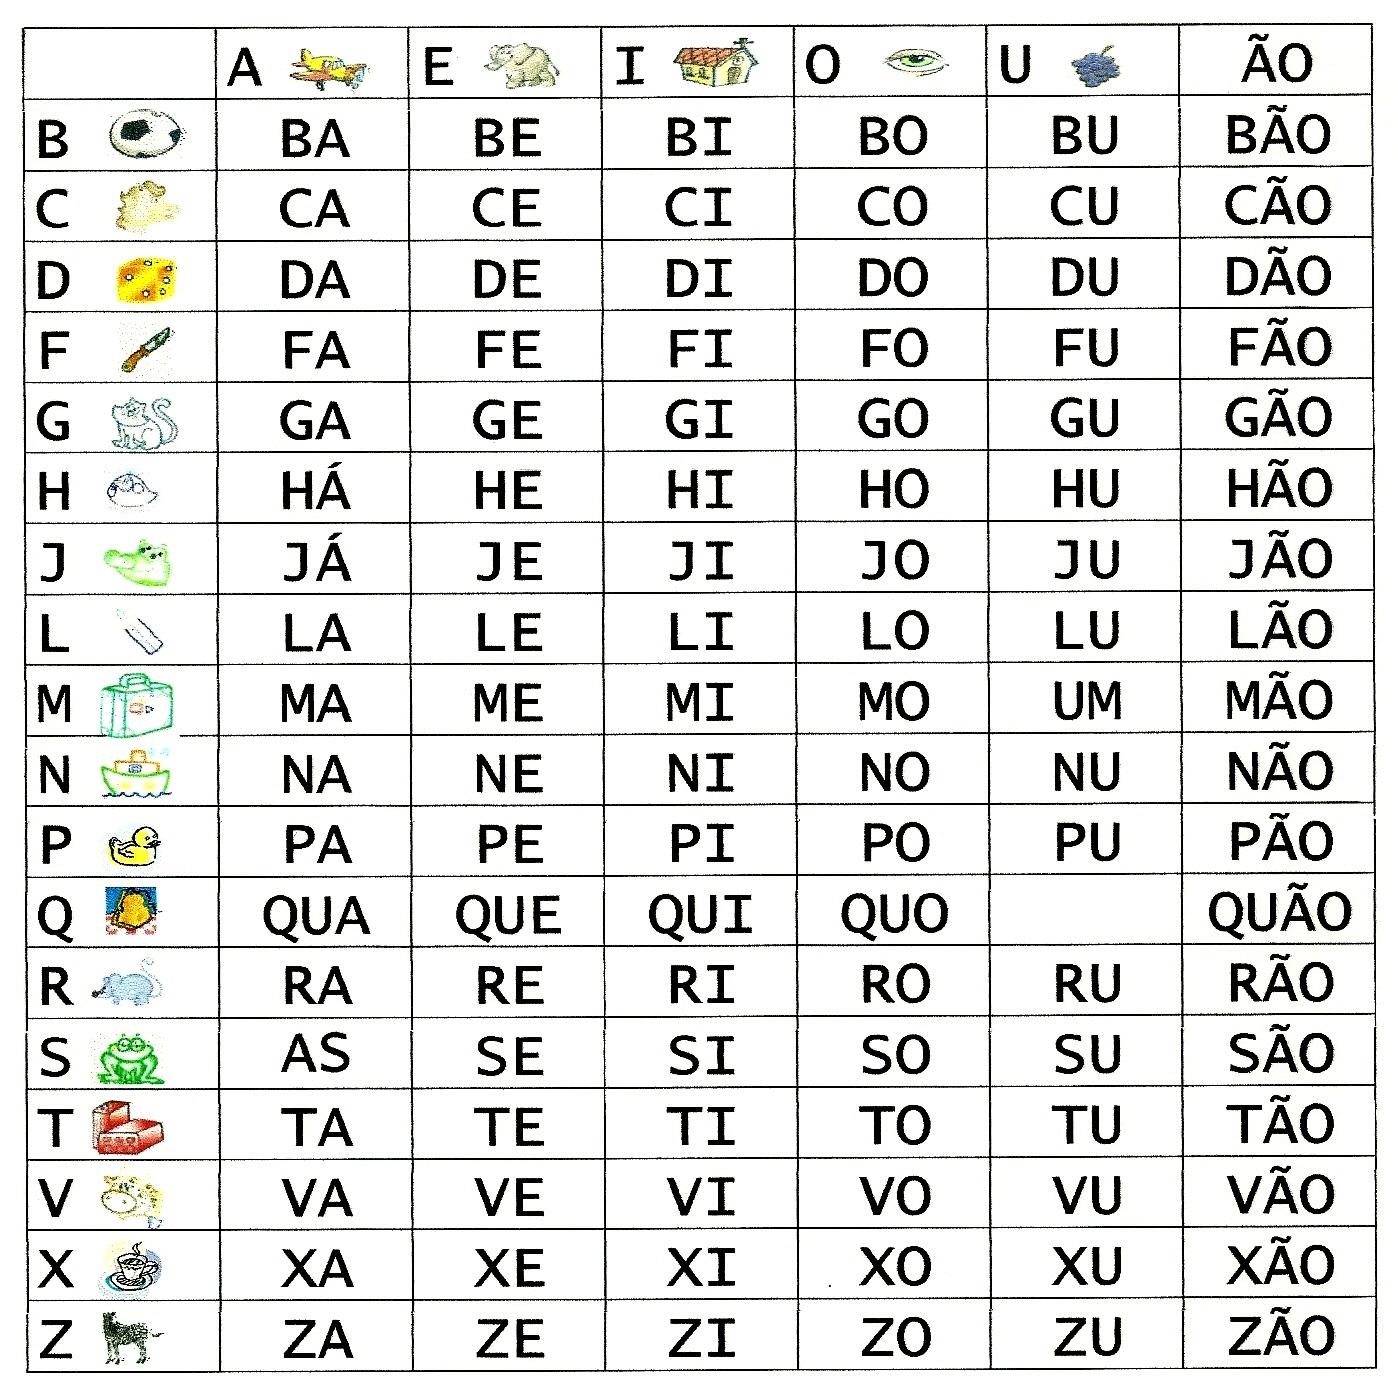 Conhecido silabário | ENSINAR E APRENDER - TEACH AND LEARN MK07